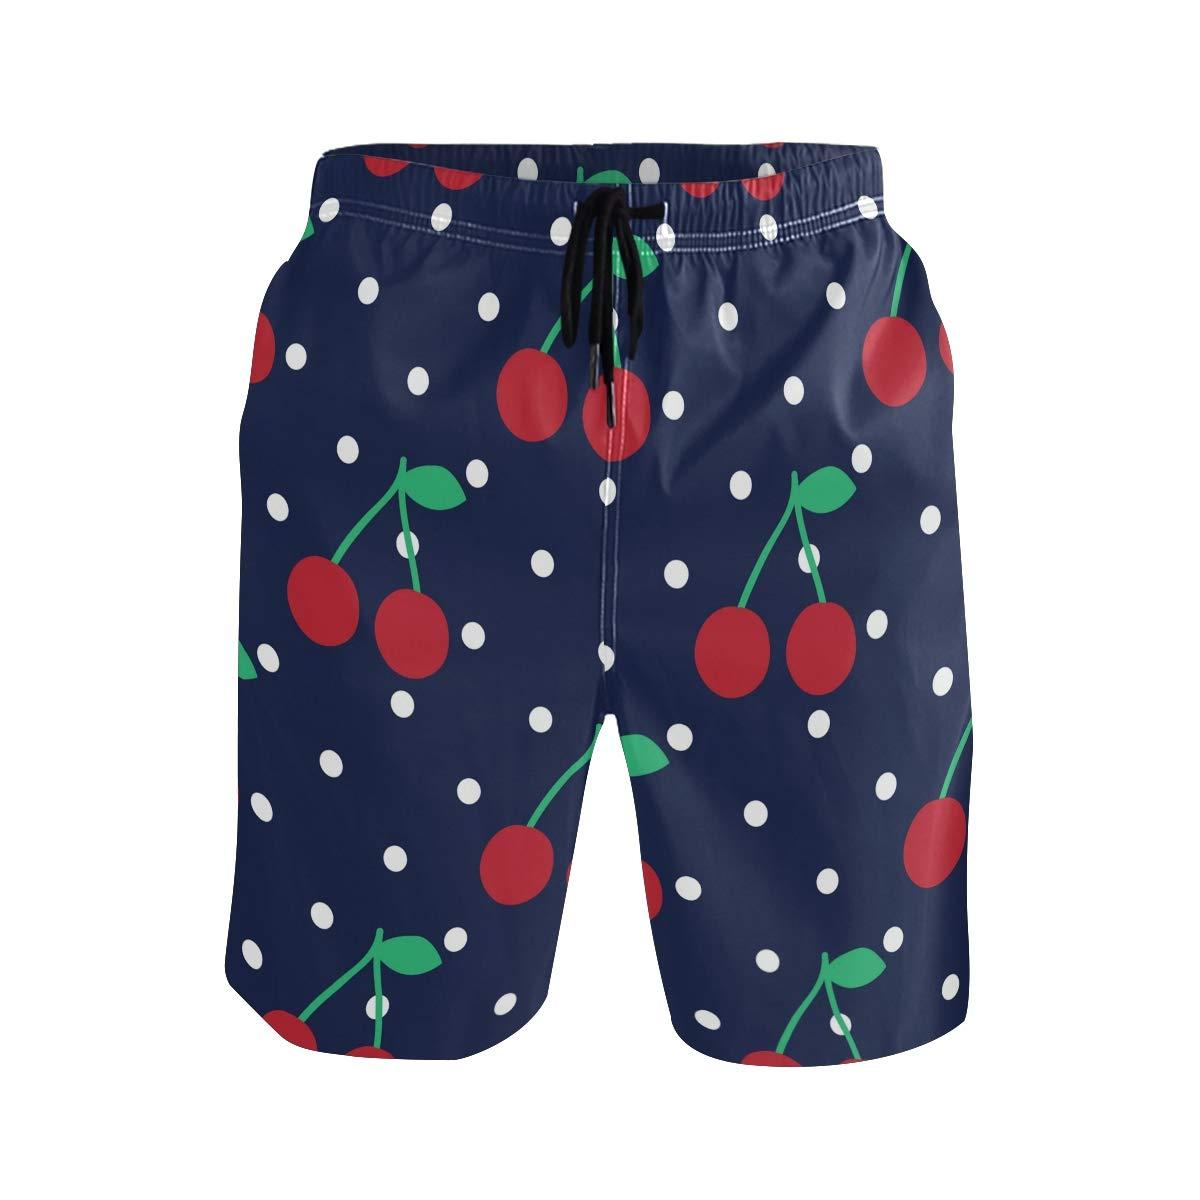 KUWT Mens Swim Trunks Polka Dot Fruit Cherry Quick Dry Beach Shorts Summer Surf Board Shorts